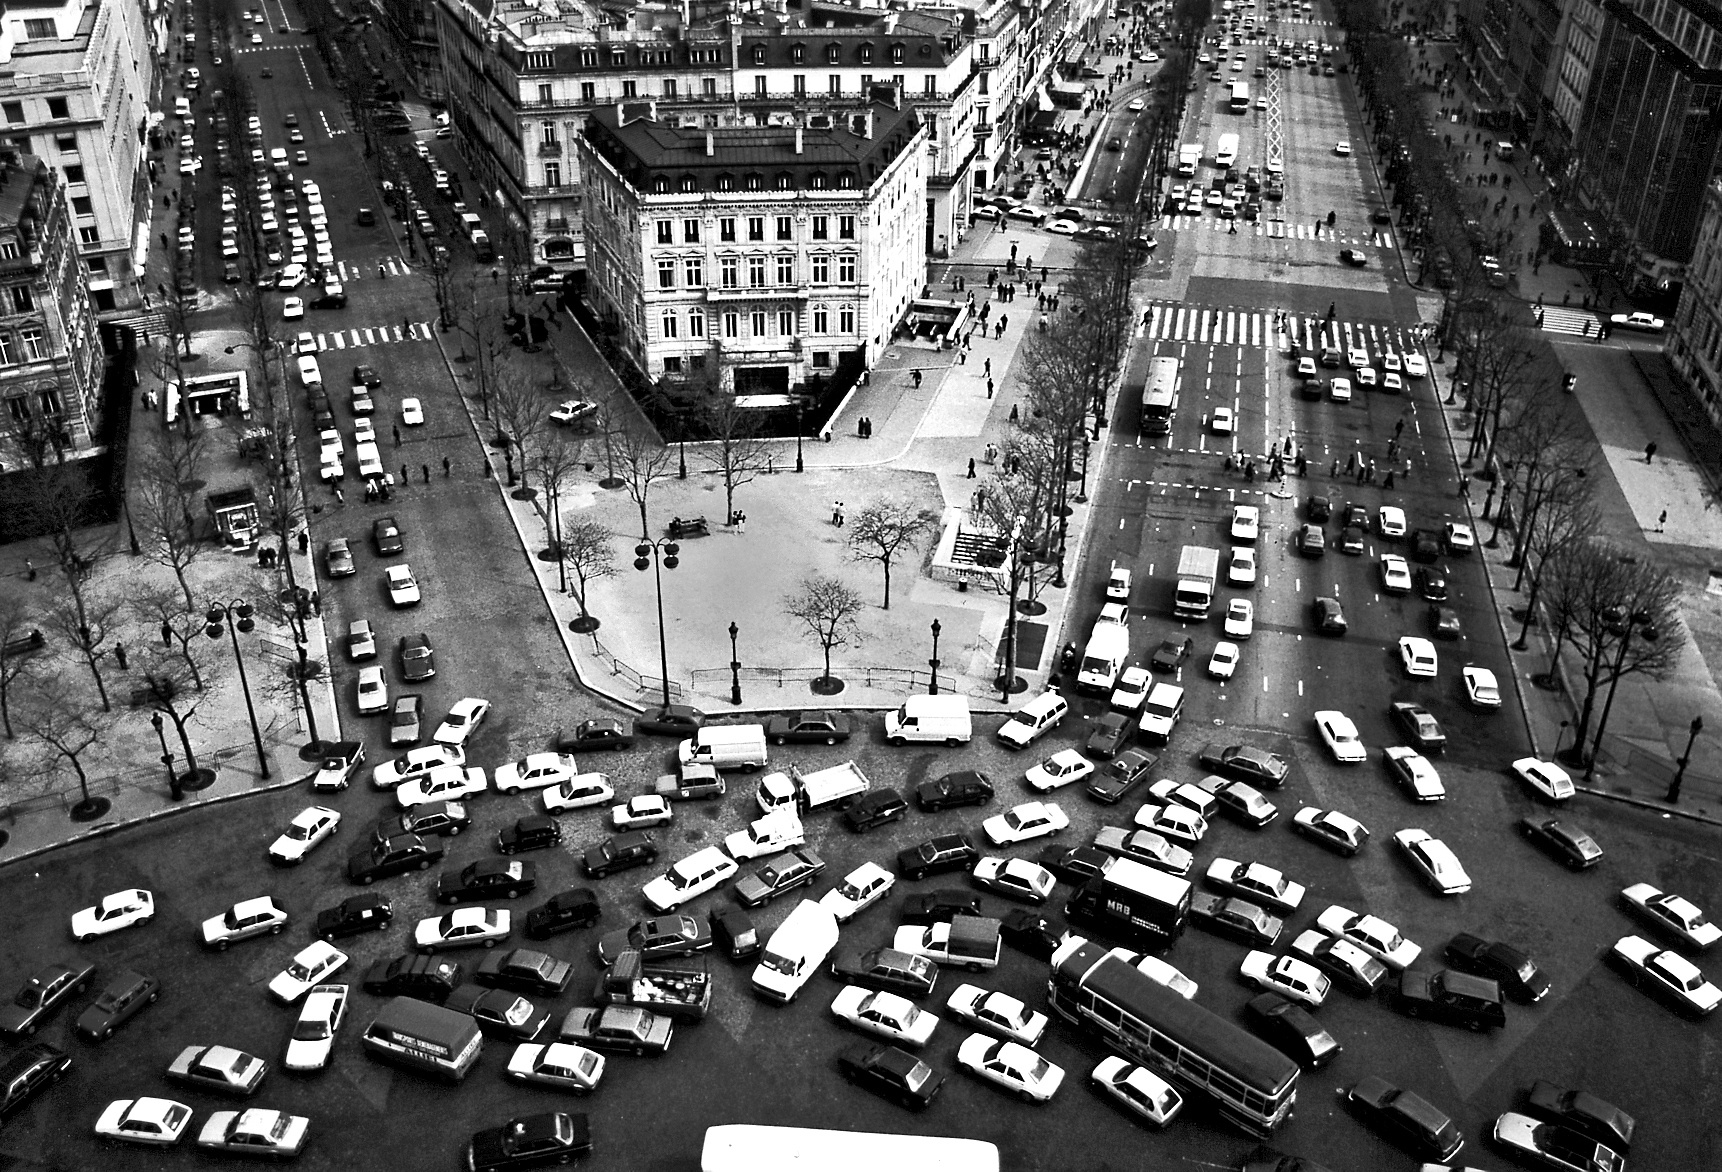 traffic-circle.jpg